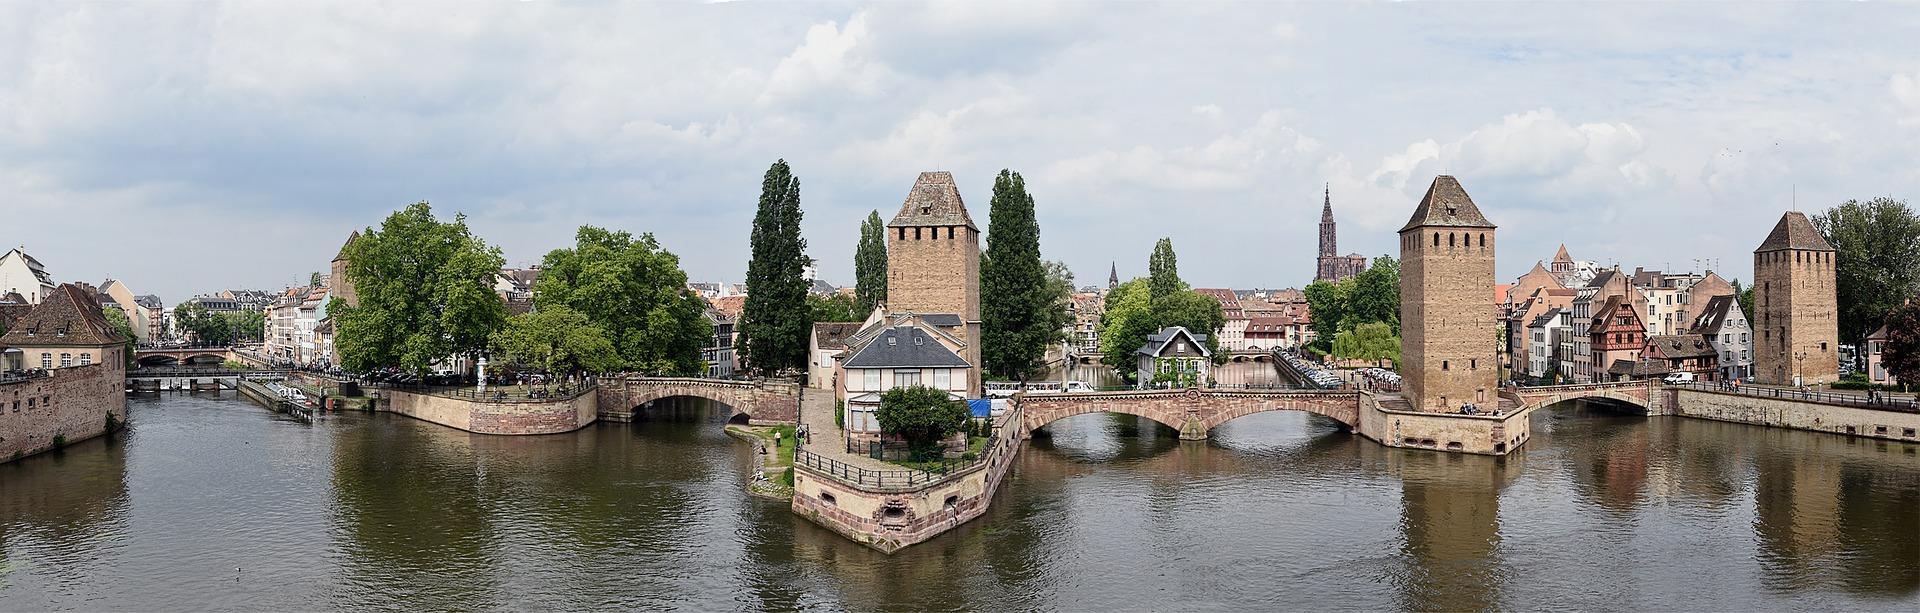 strasbourg-775149_1920